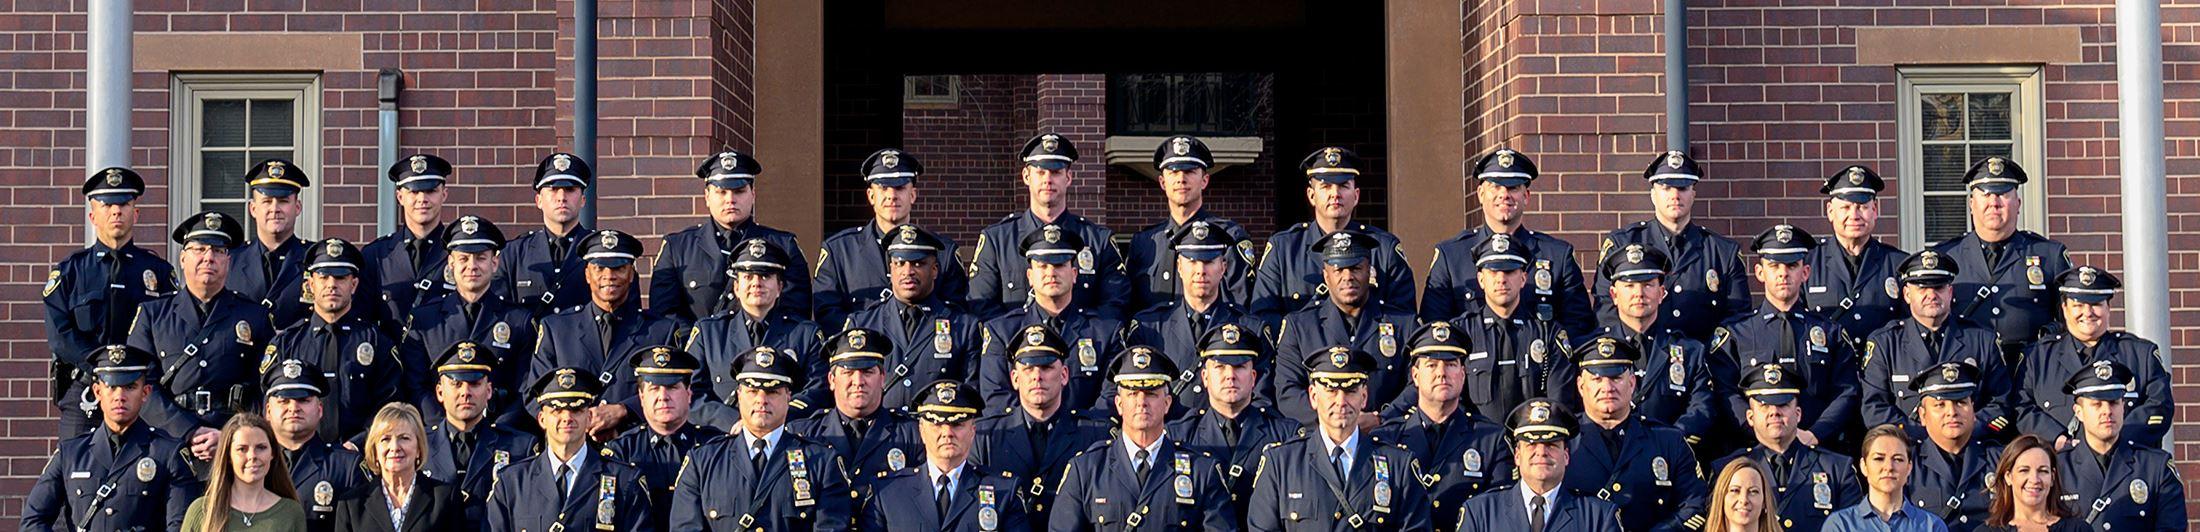 Police Department Summit Nj